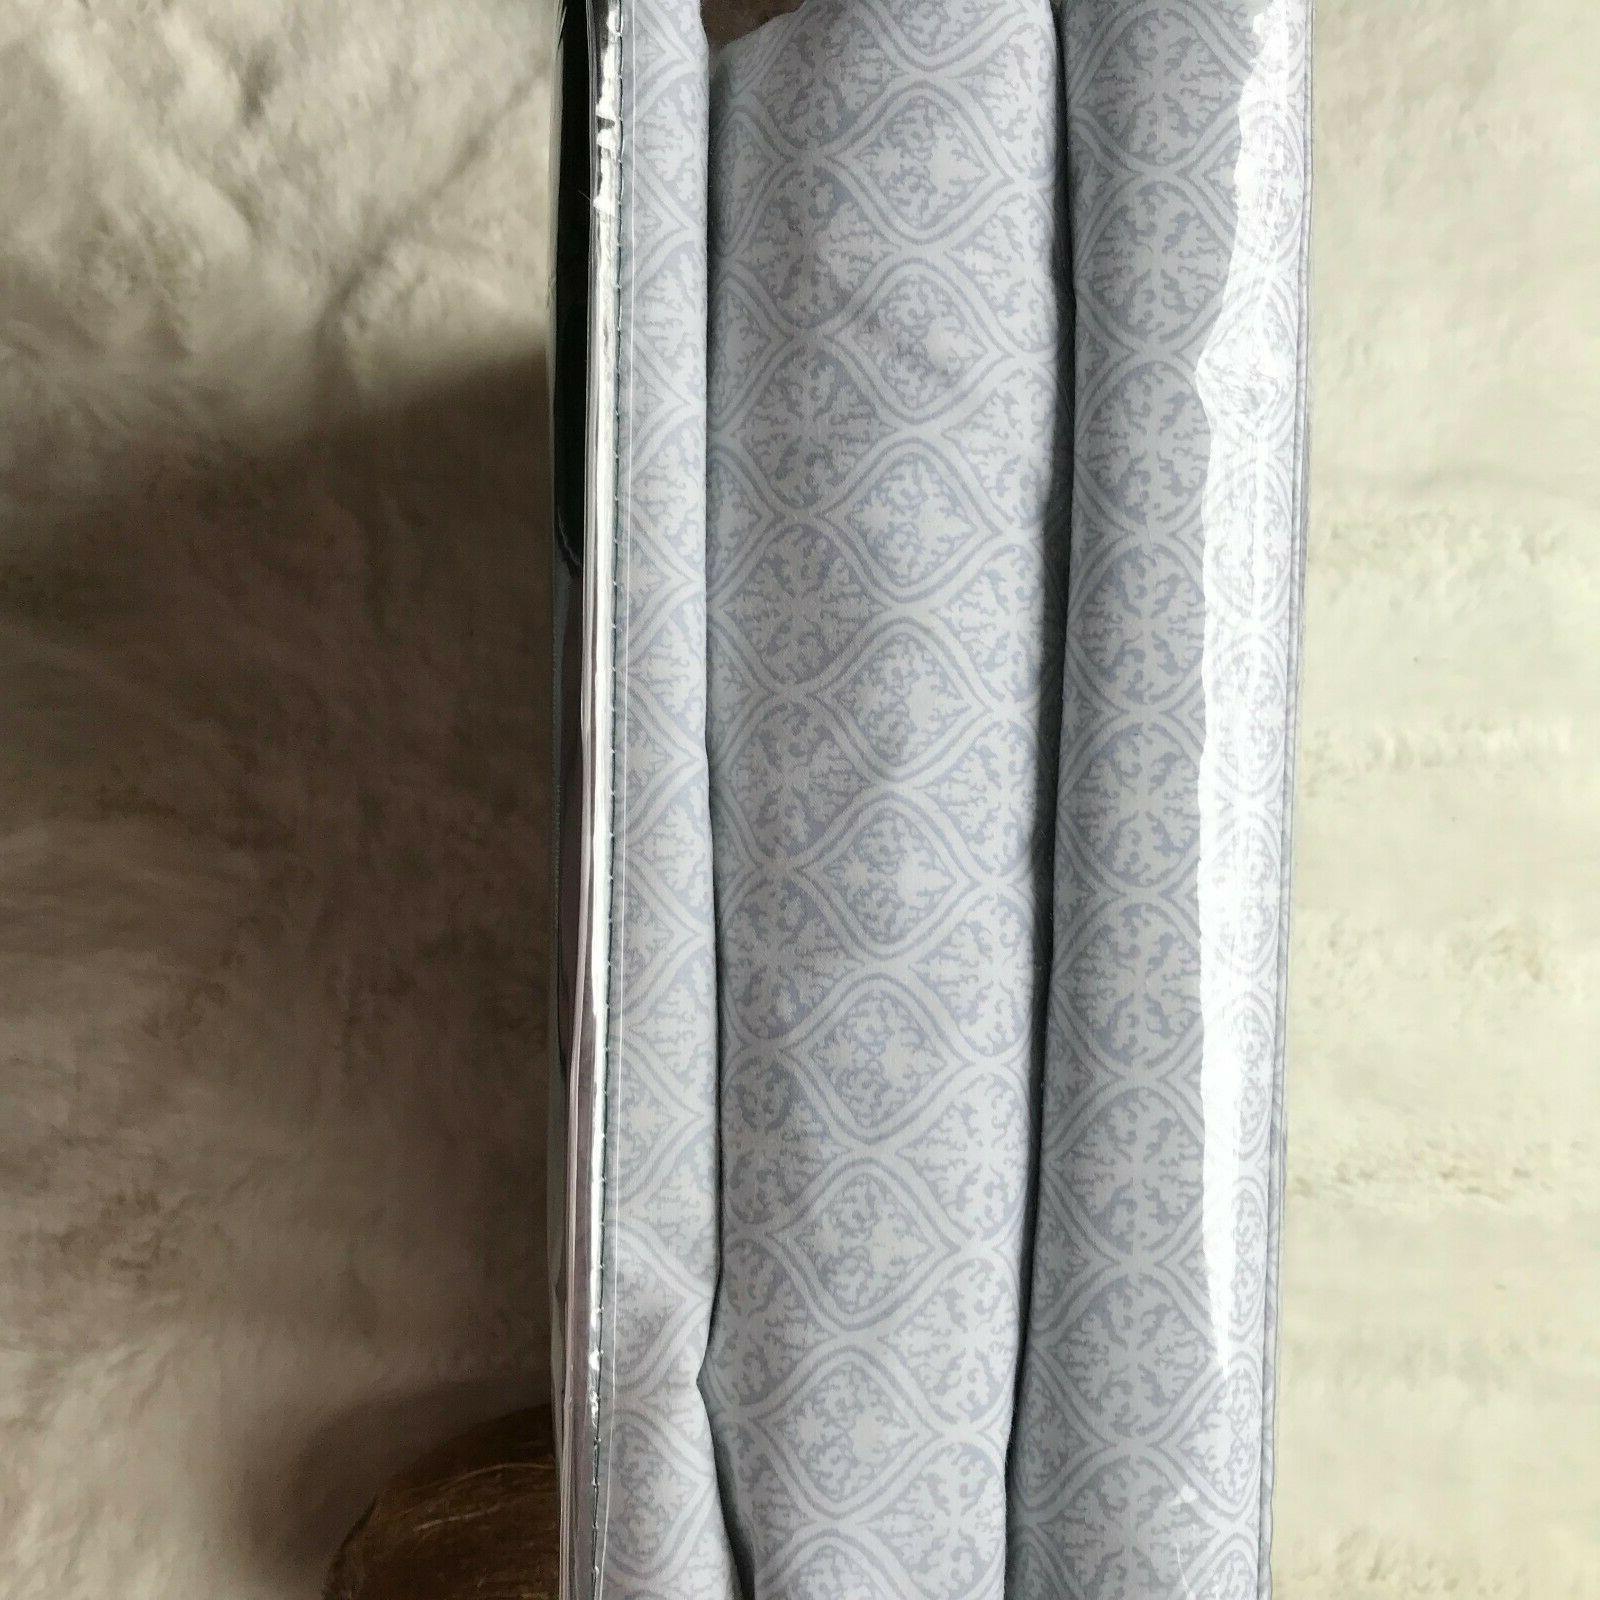 LAUREN LAUREN Cotton White/Blue Sheet Set